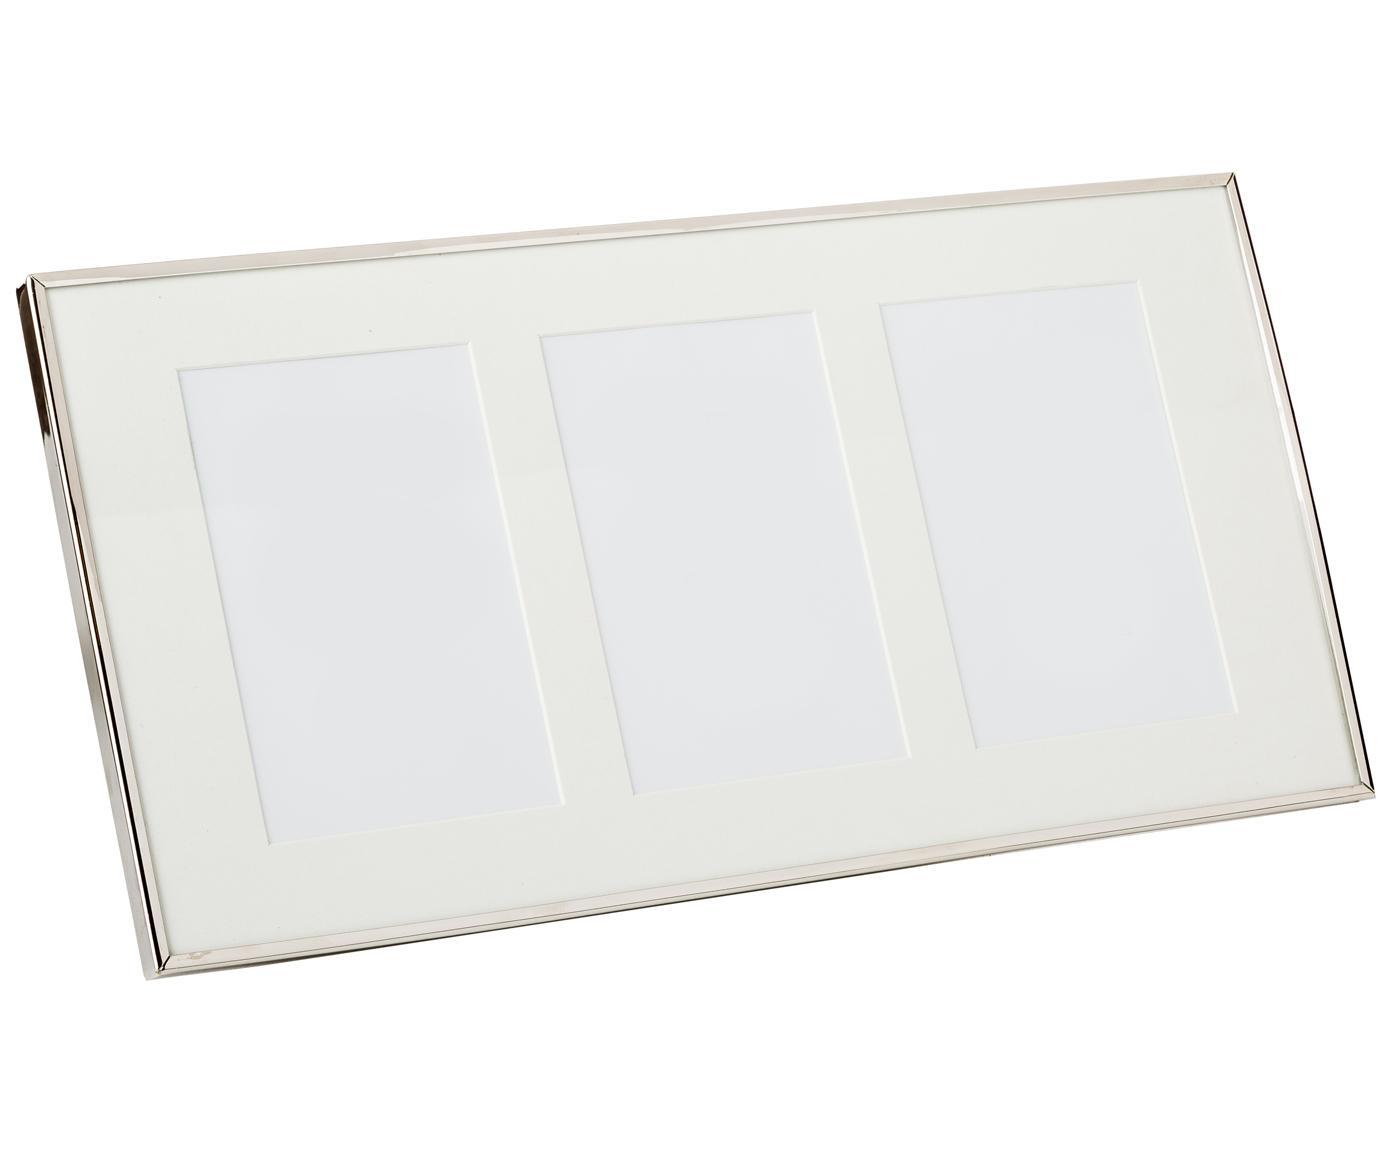 Marco Eva, Parte trasera: fibras de densidad media,, Plateado, Para 3 fotos de 10 x 15 cm.